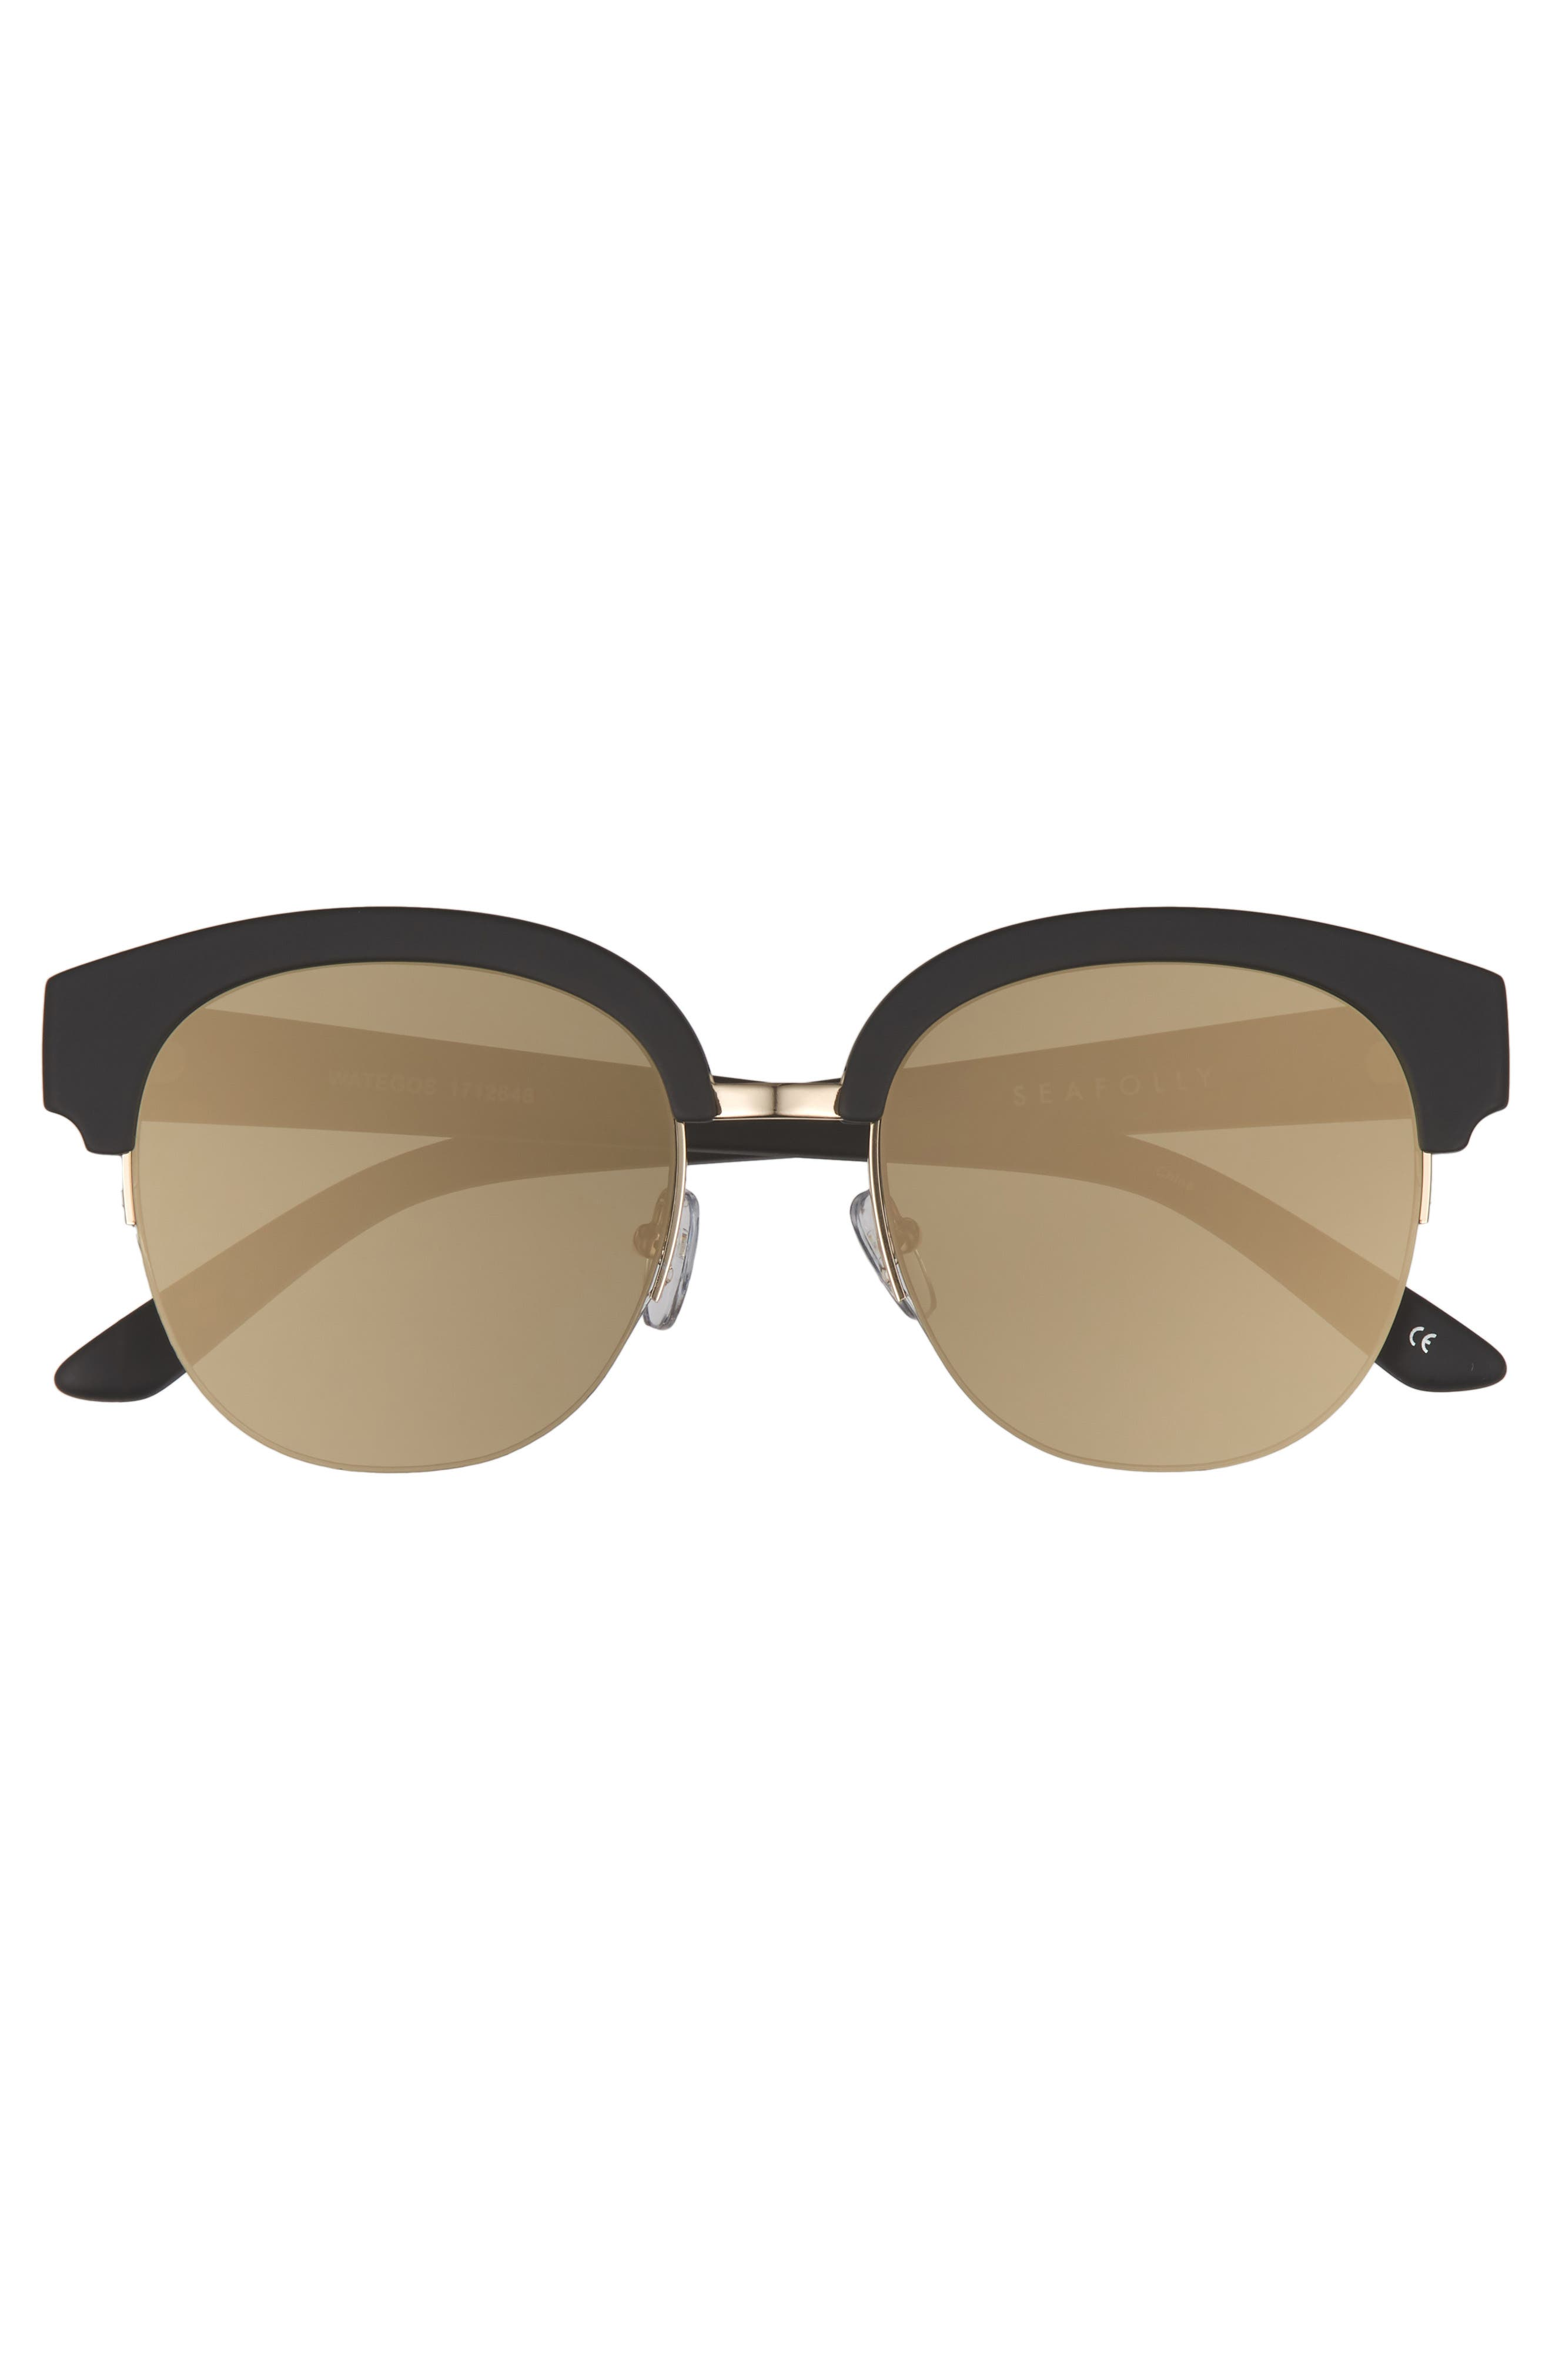 Wategos 53mm Cat Eye Sunglasses,                             Alternate thumbnail 3, color,                             001